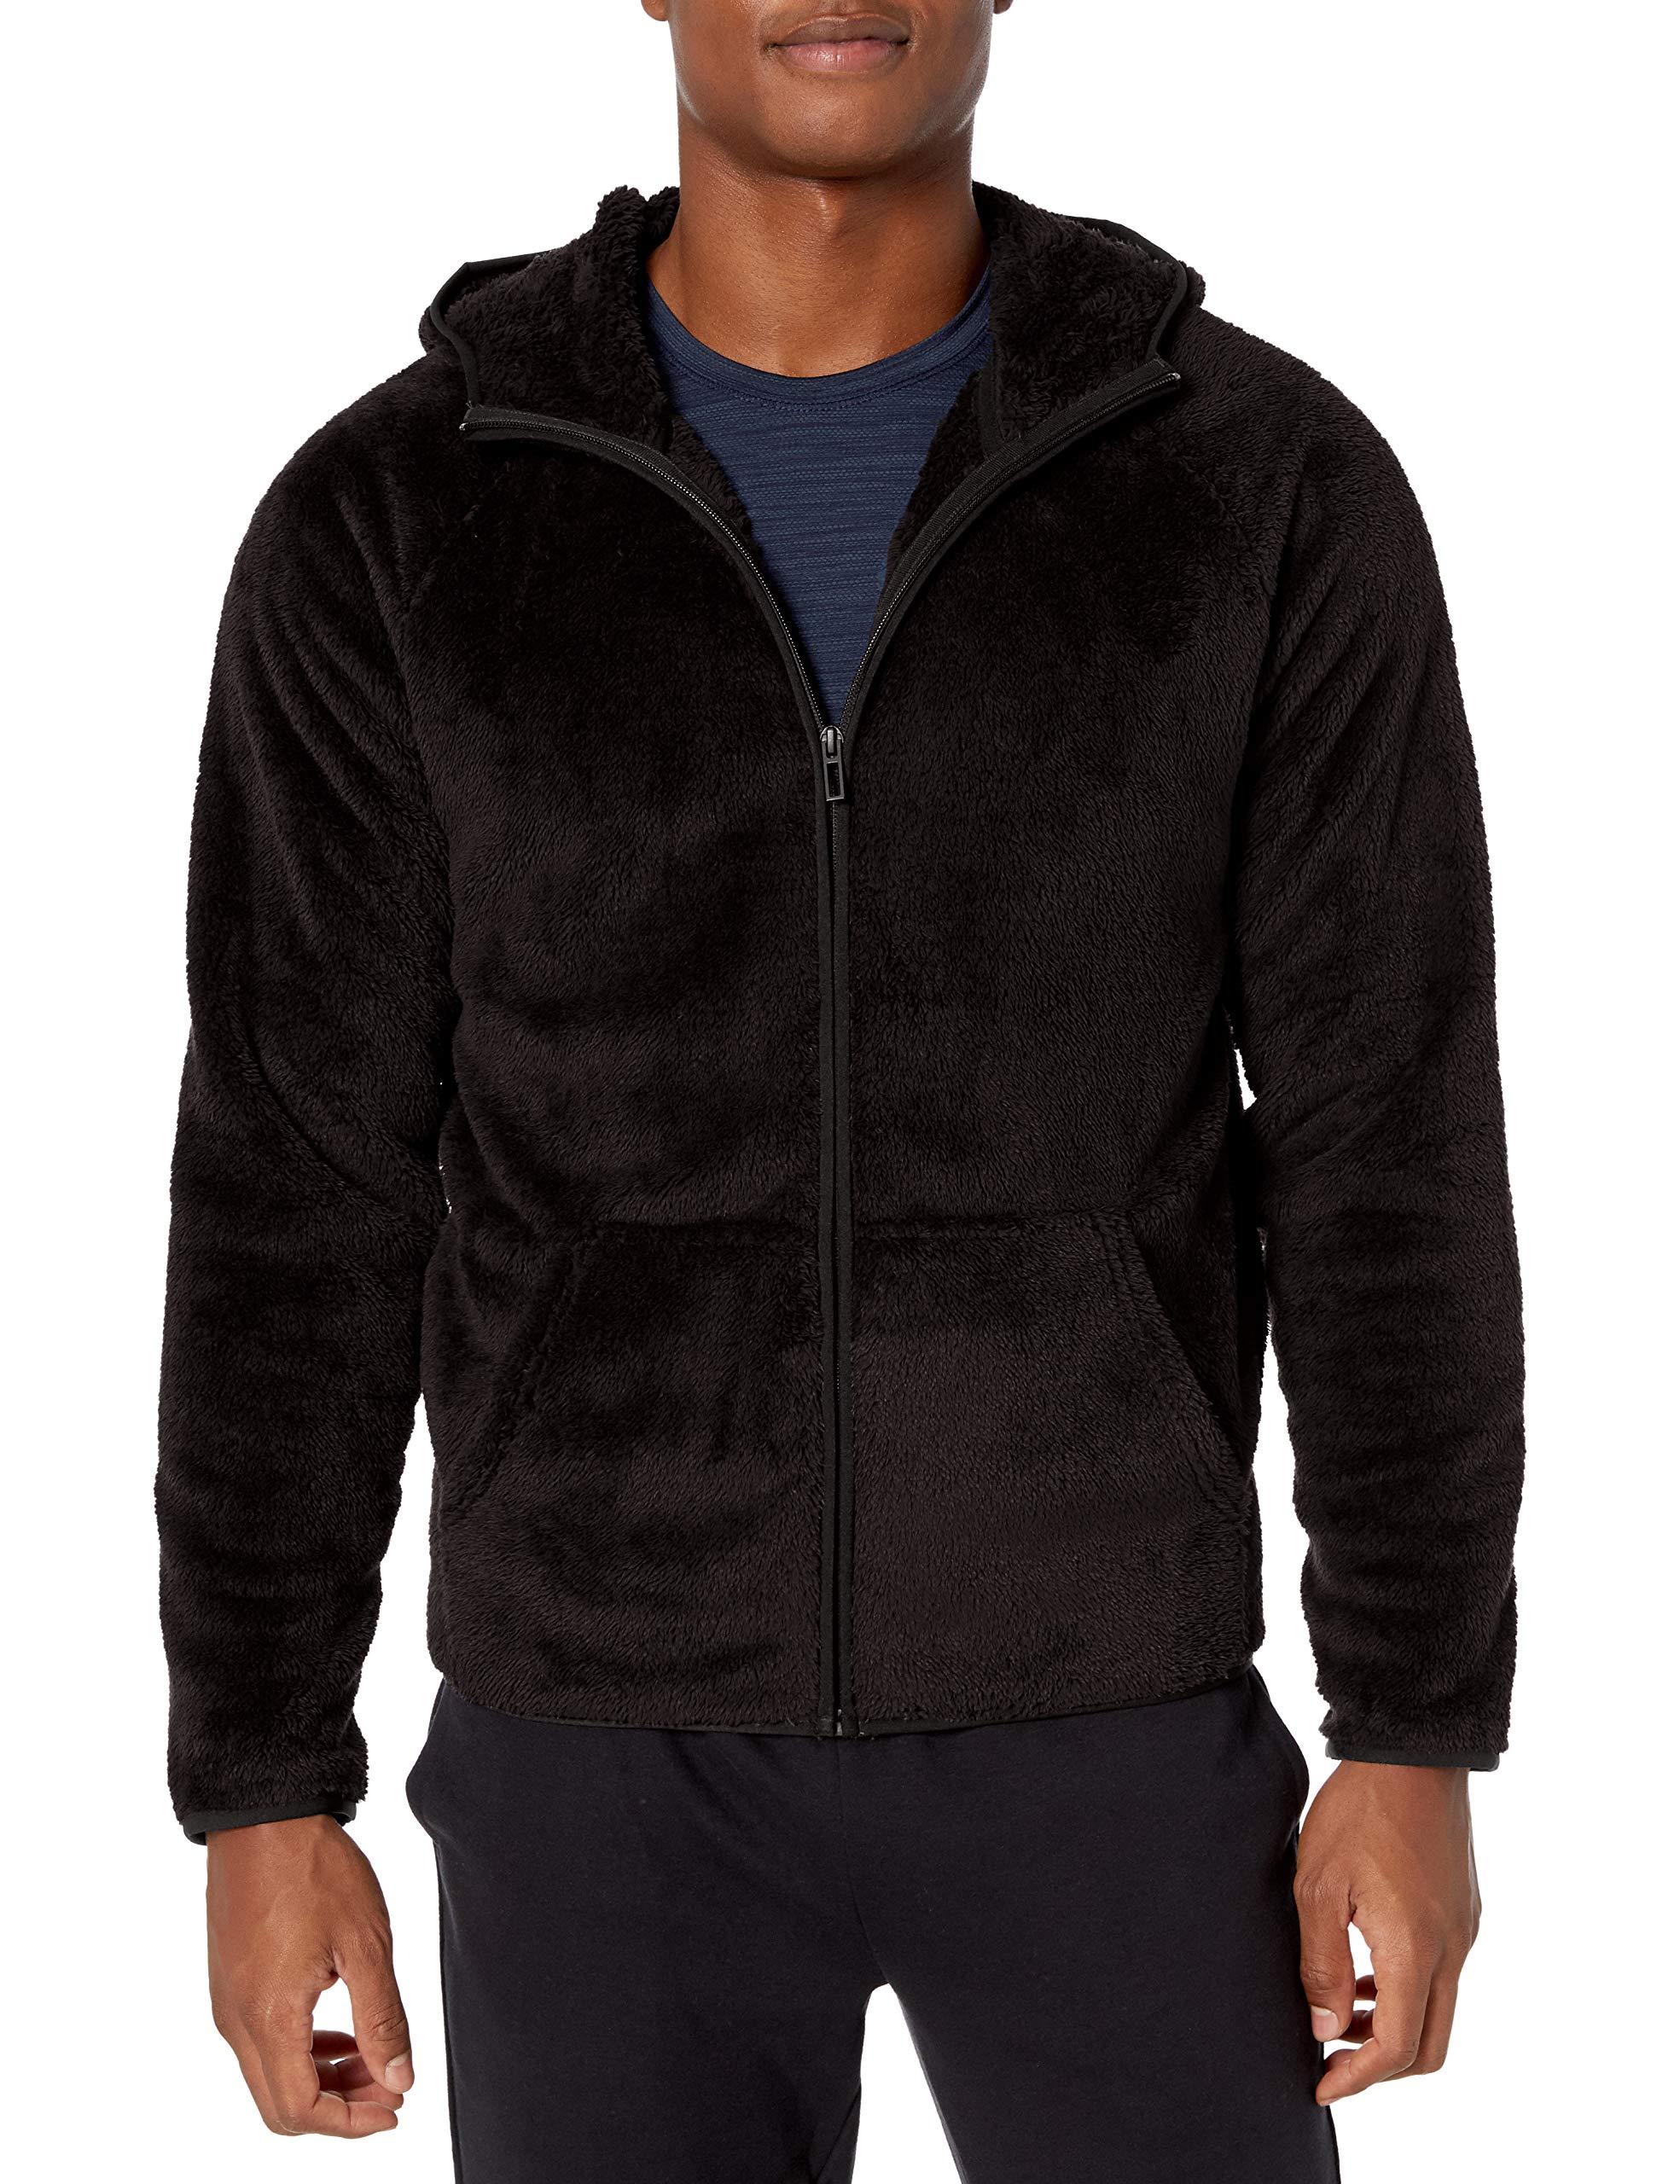 Peak Velocity Mens Cooldown Ultra-Soft Athletic-Fit Jacket Jacket